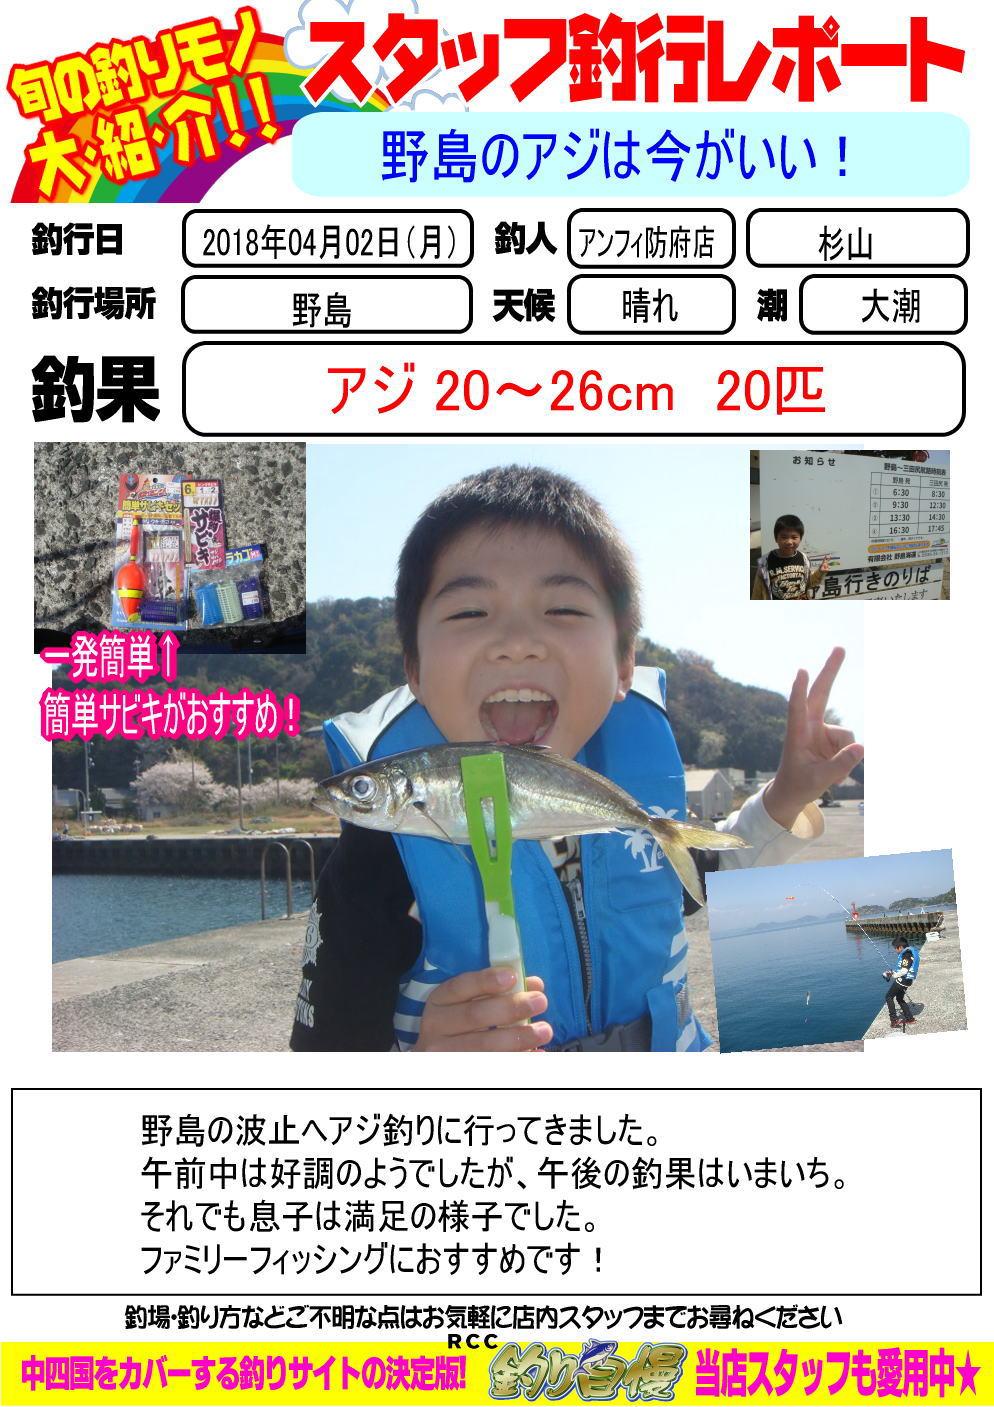 http://www.e-angle.co.jp/shop/blog/blog-20180402-houfu-aji.jpg